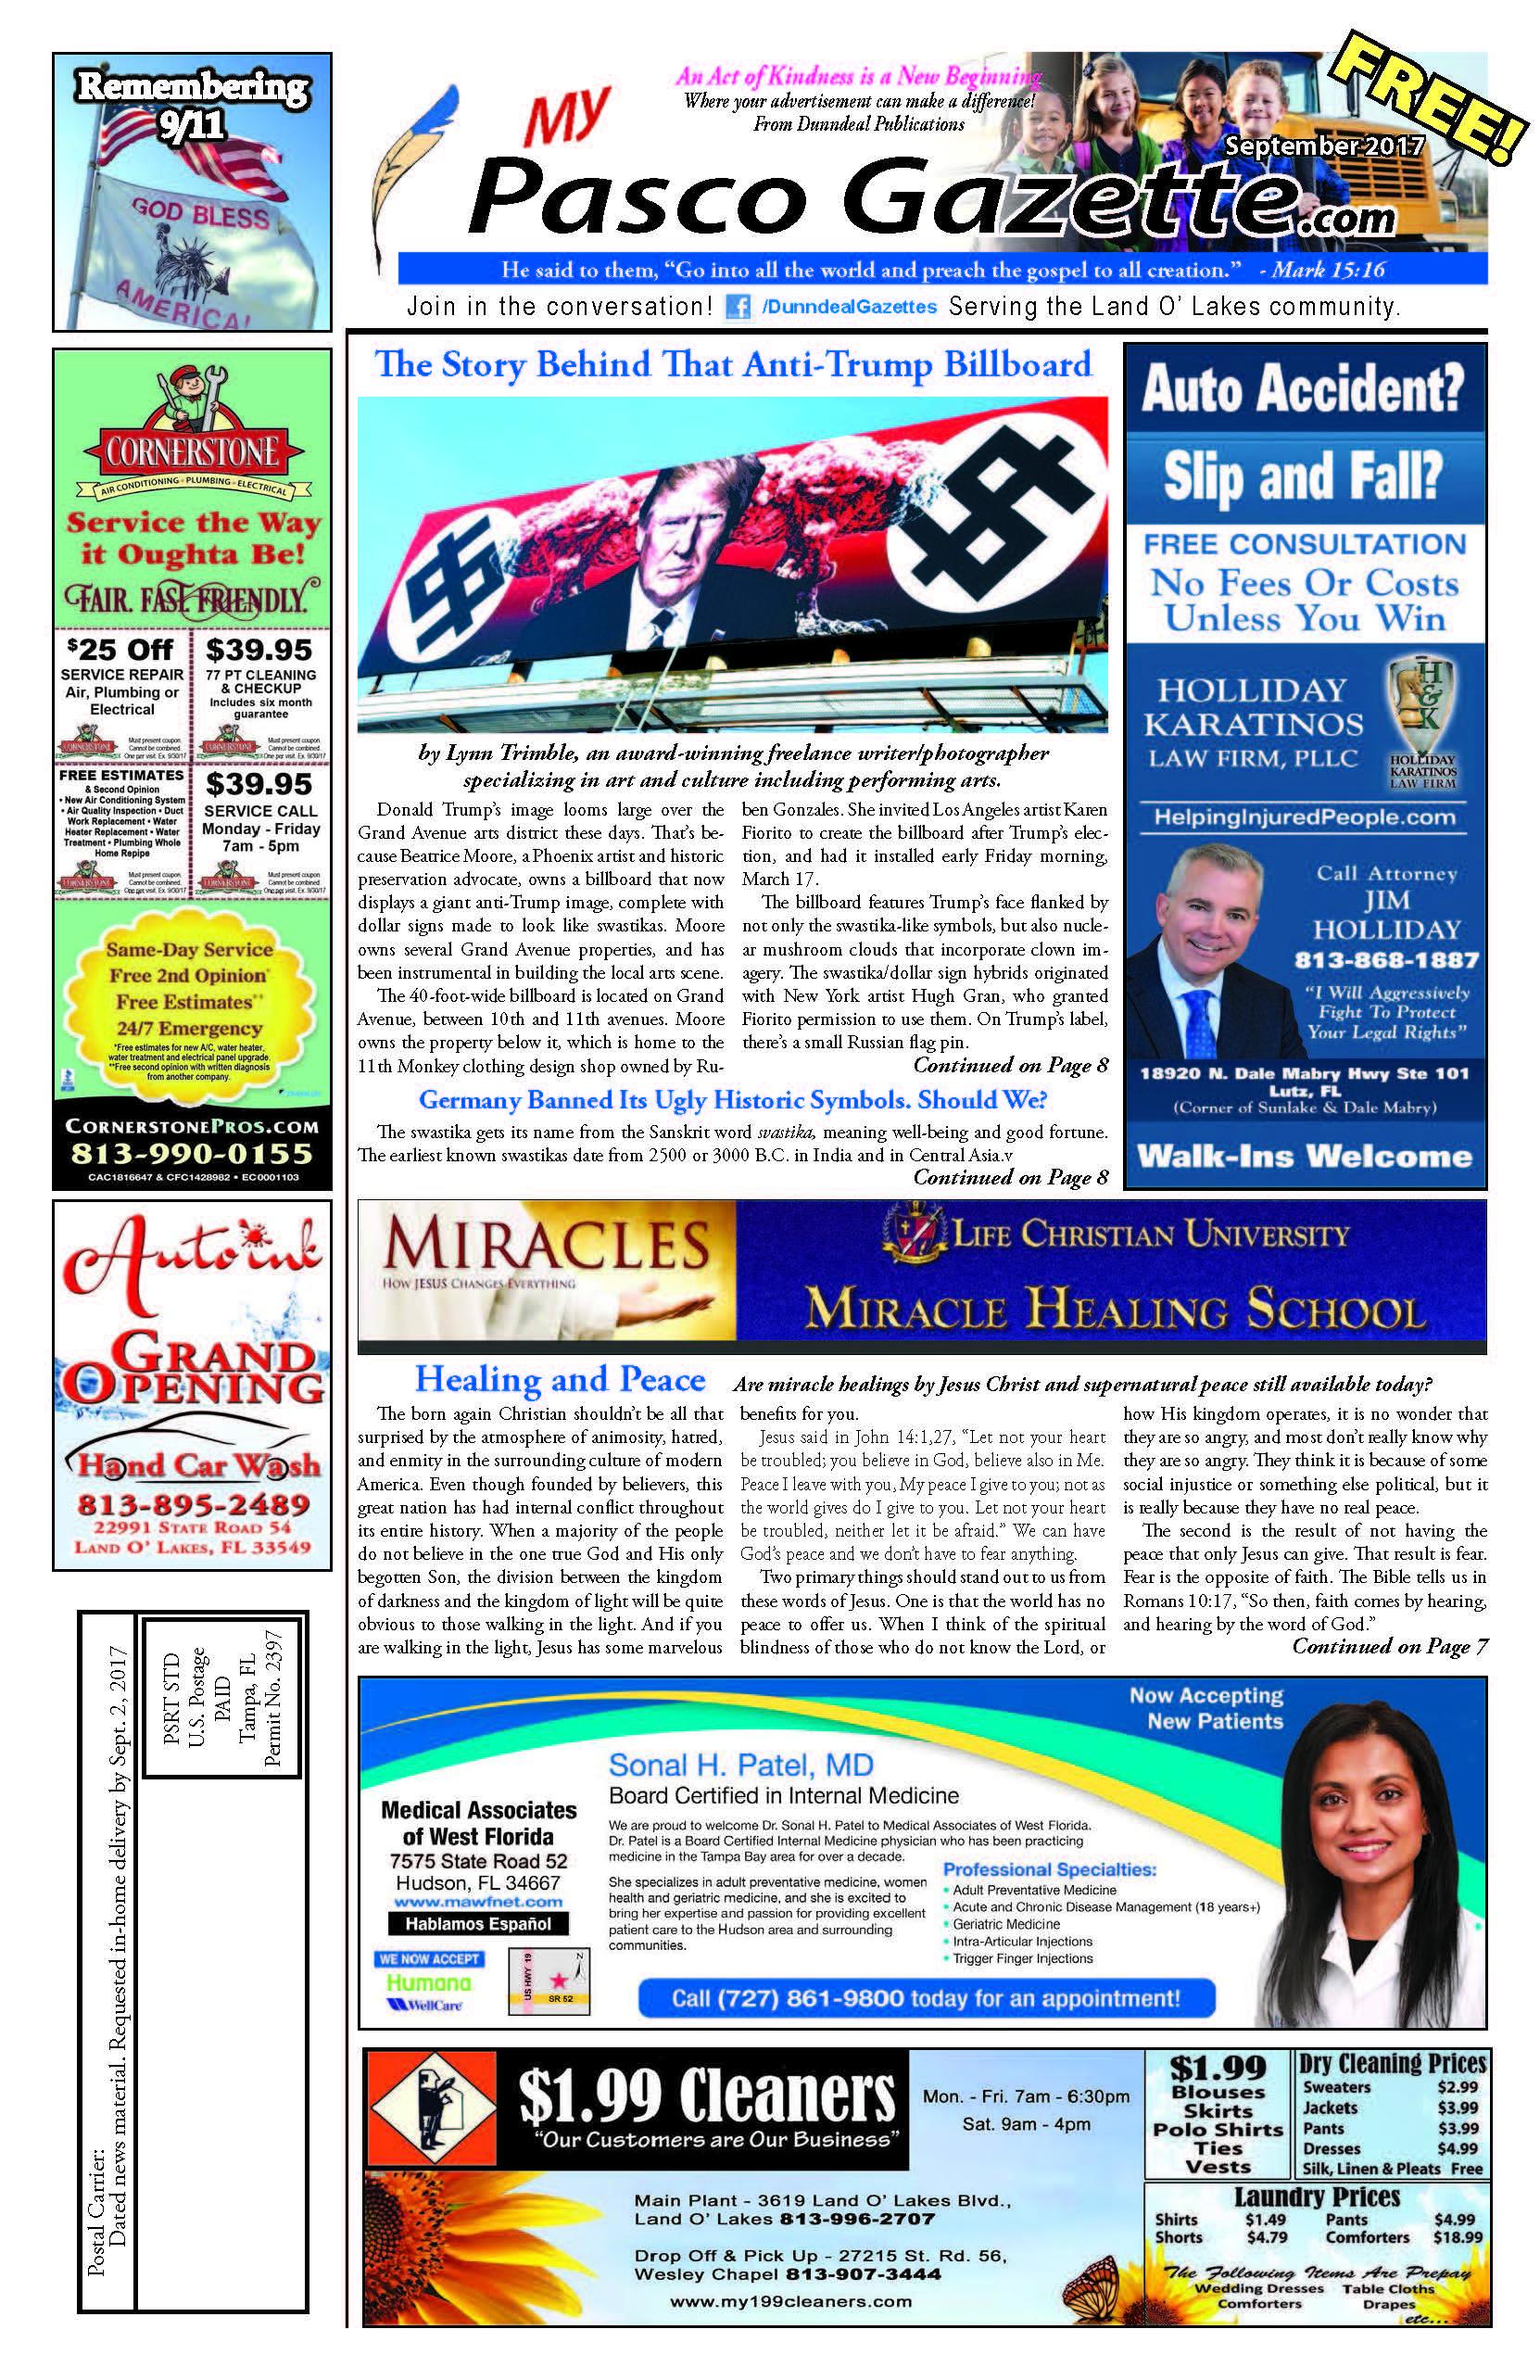 Pasco-Gazette-September-2017_Page_01.jpg